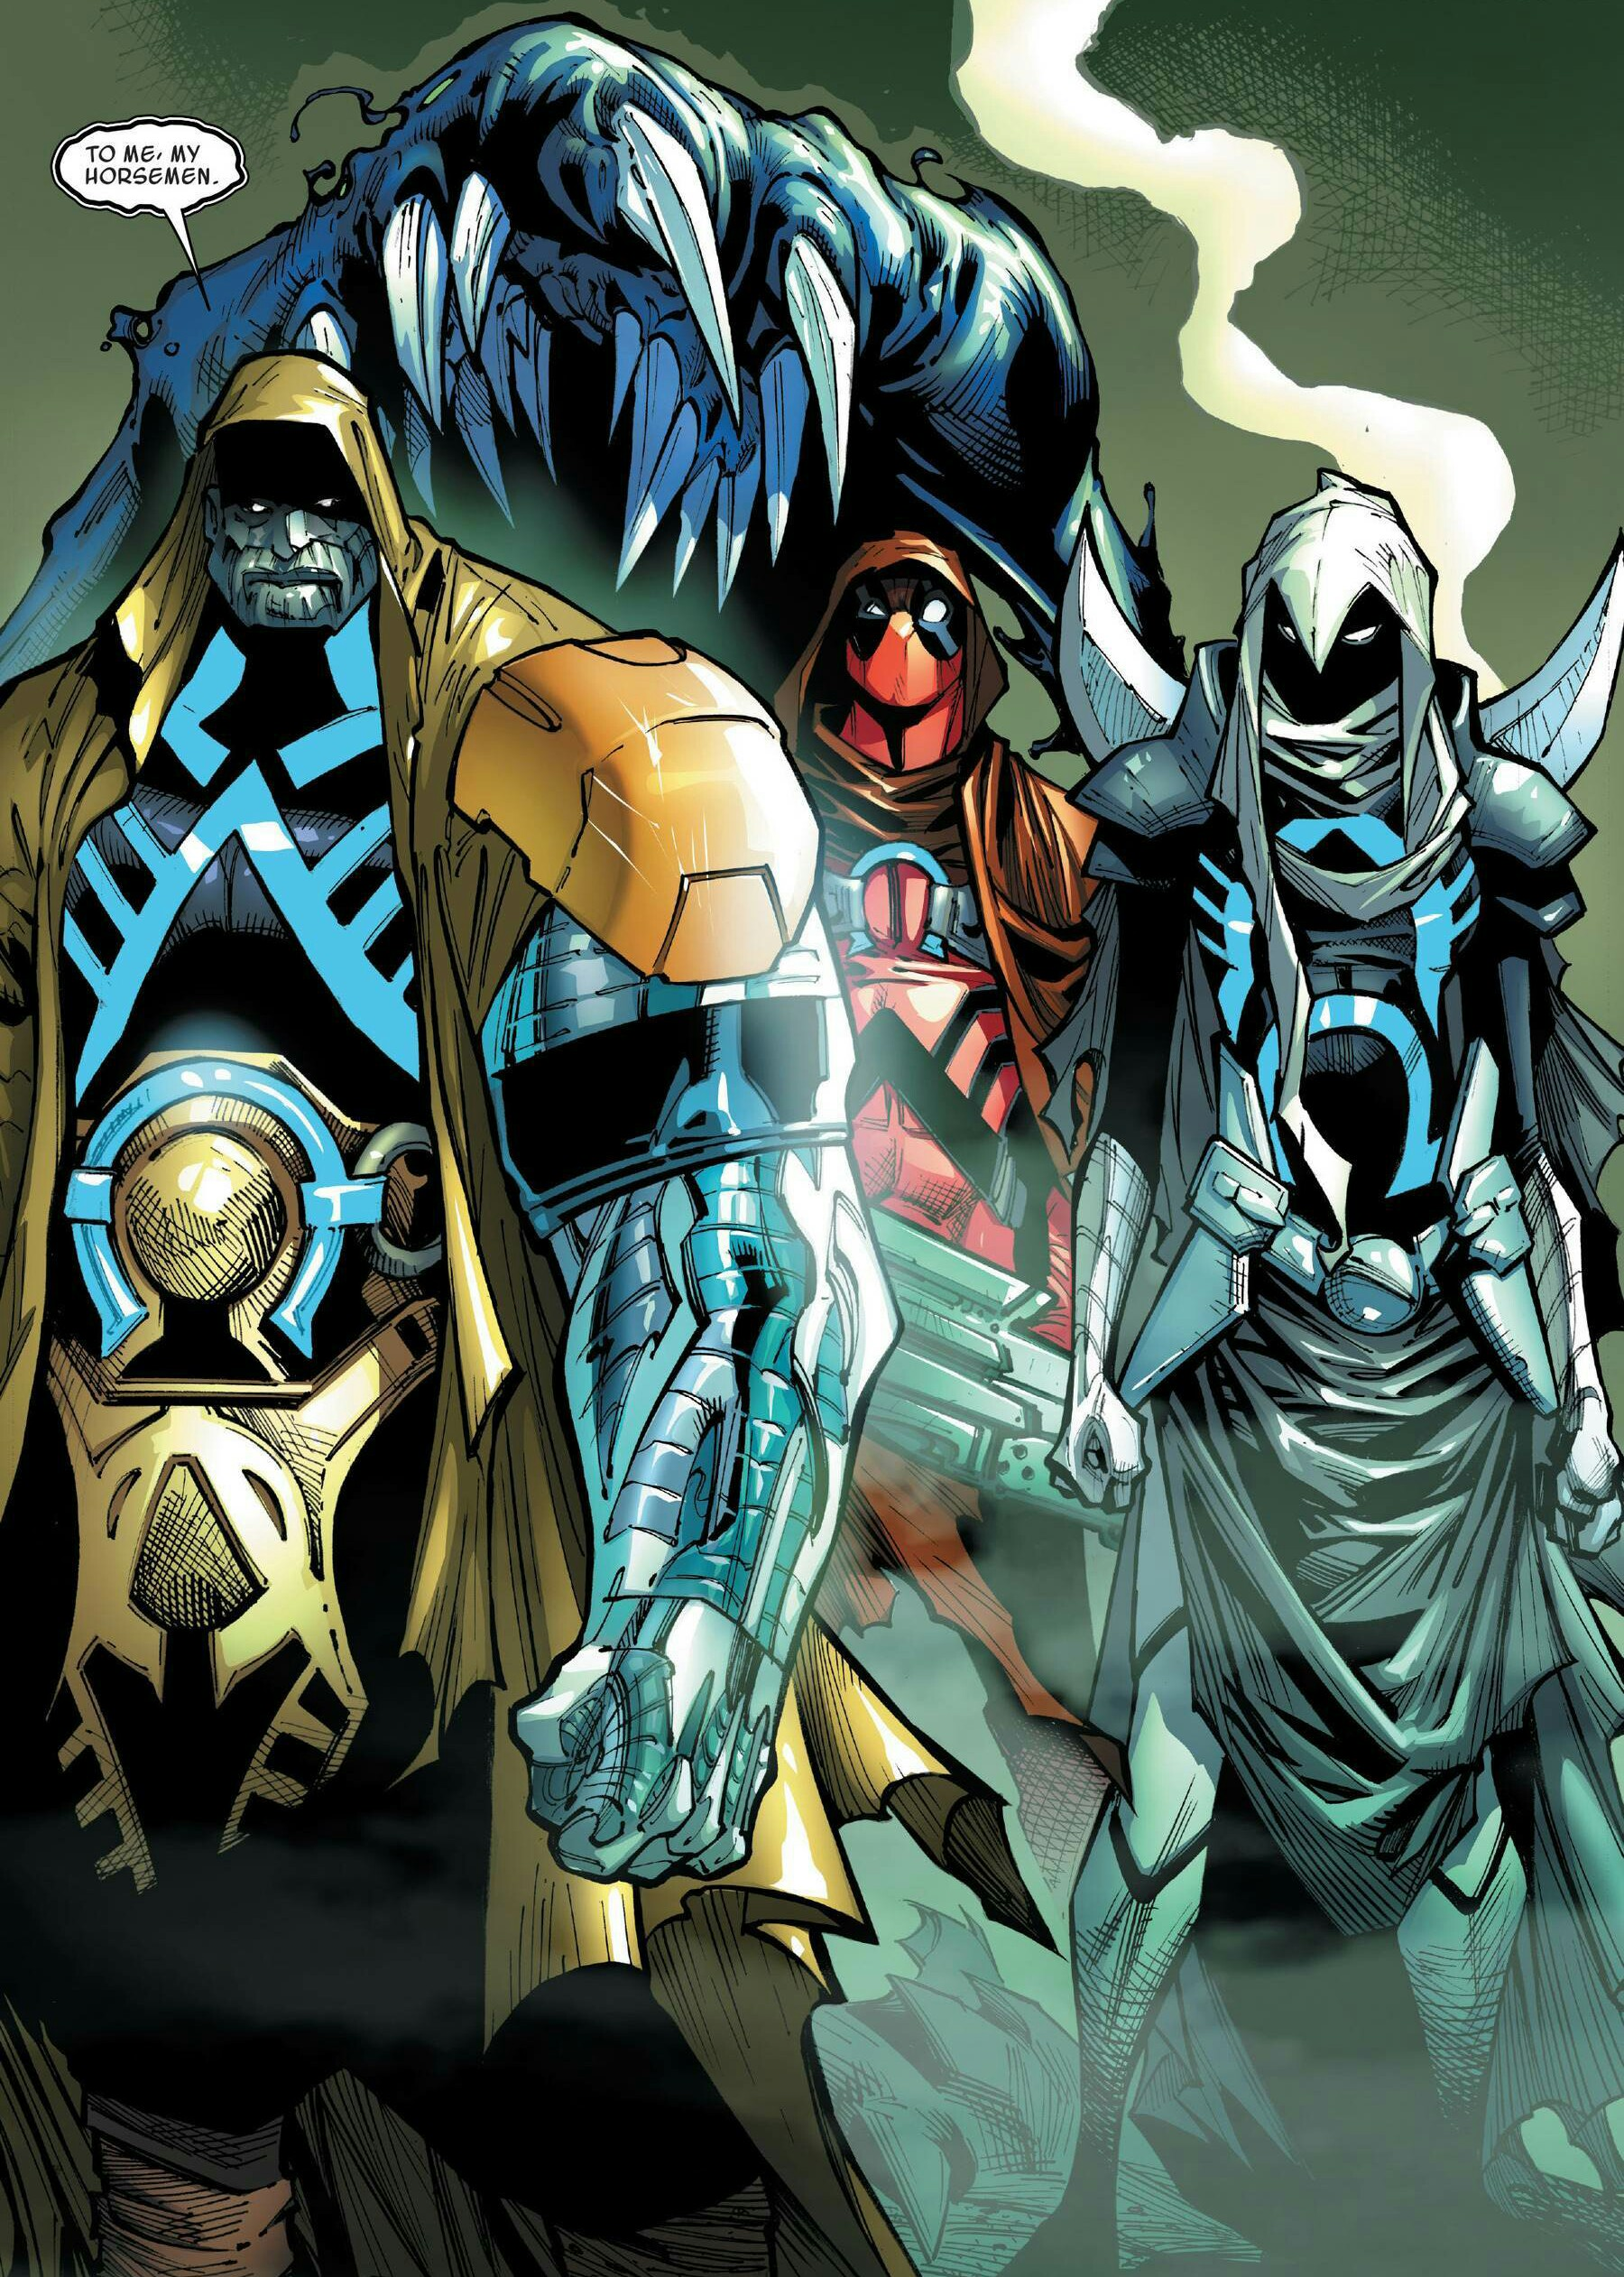 Horsemen of Apocalypse (Earth-TRN574)